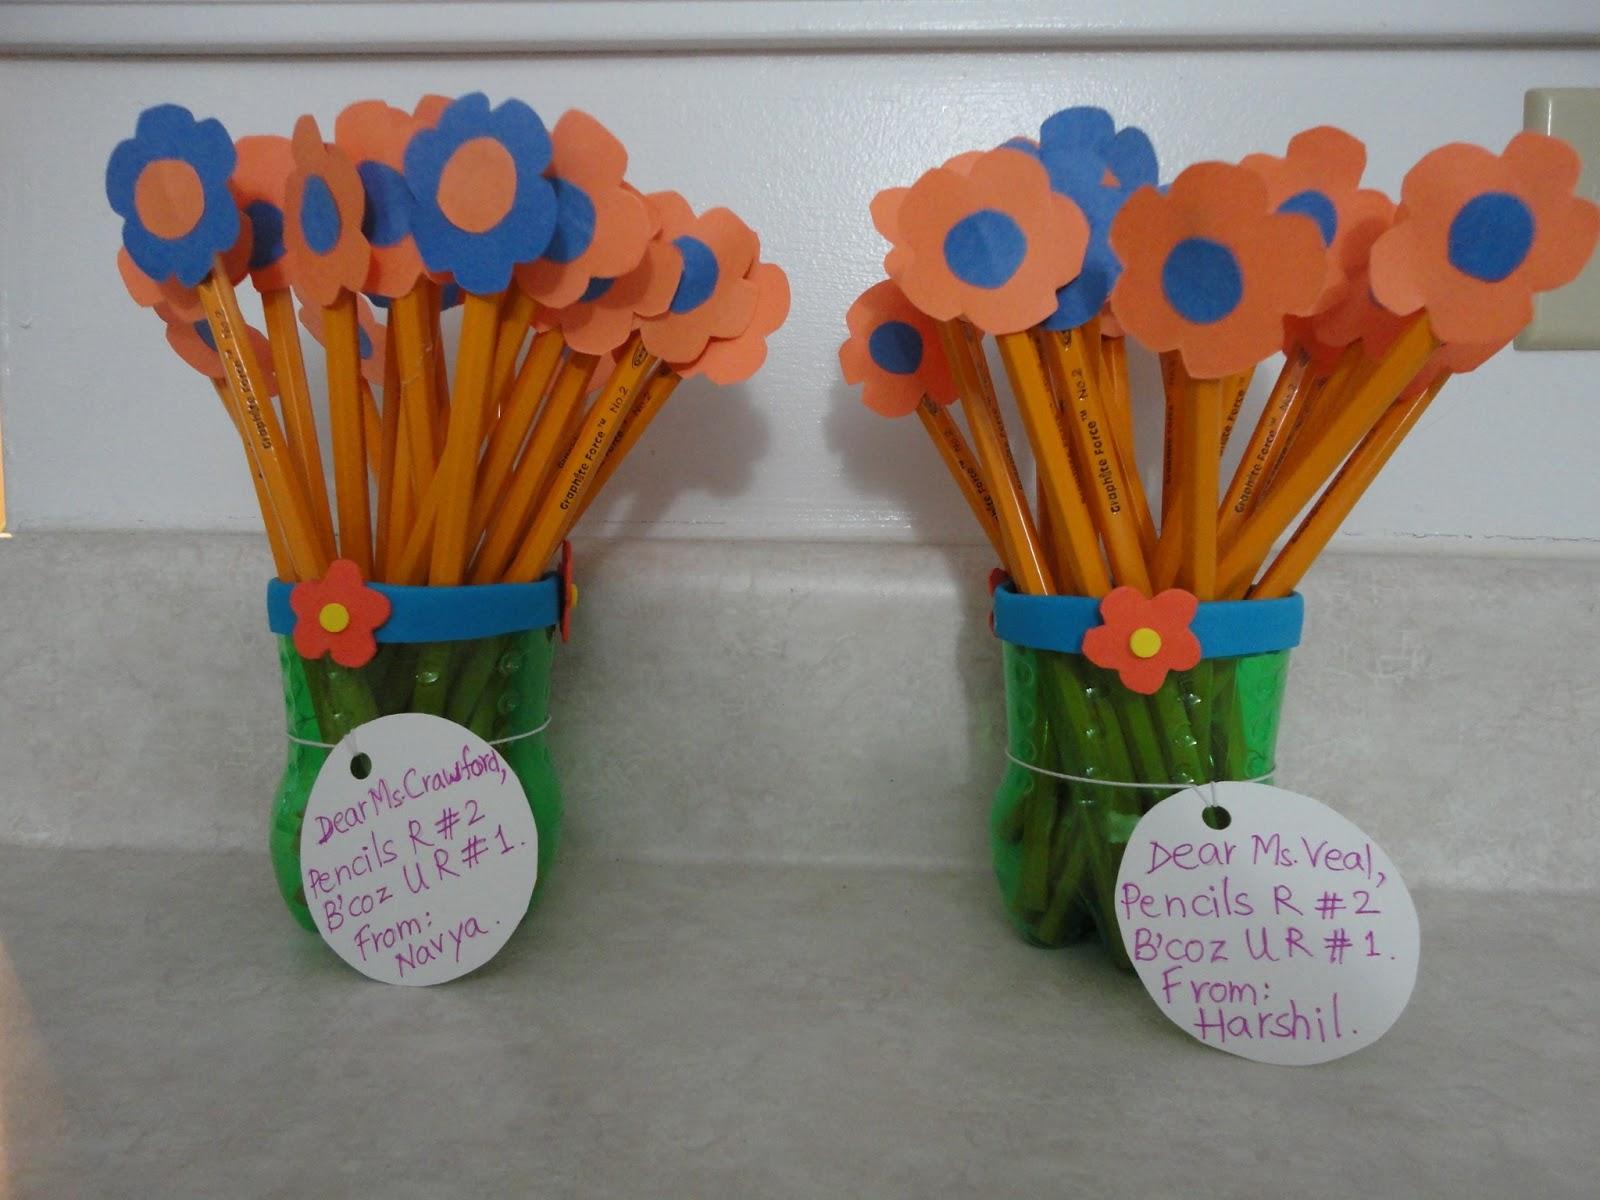 Nisha S Creative Arts And Crafts Pencil Vase For Teacher